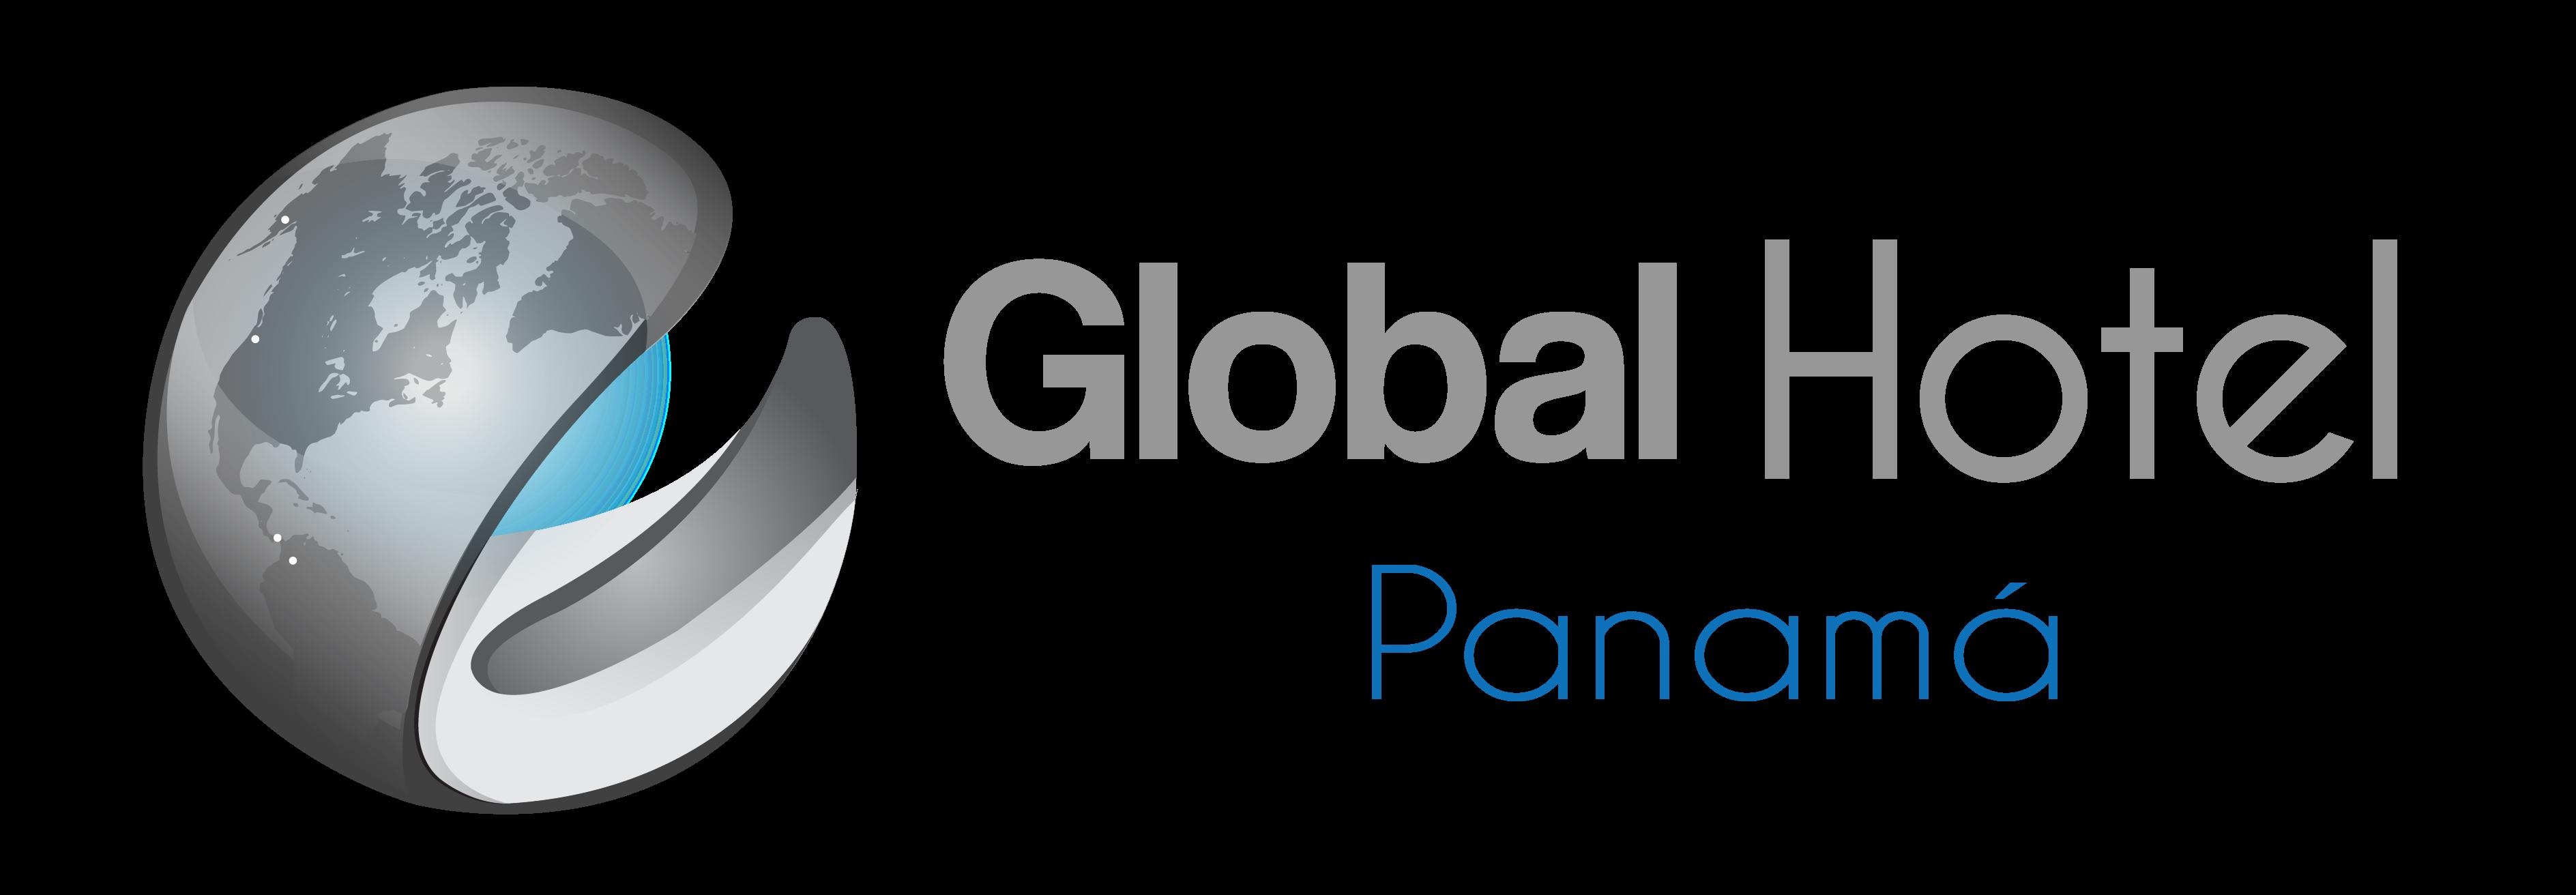 Global Hotel Panama - Twist Hotels Corp